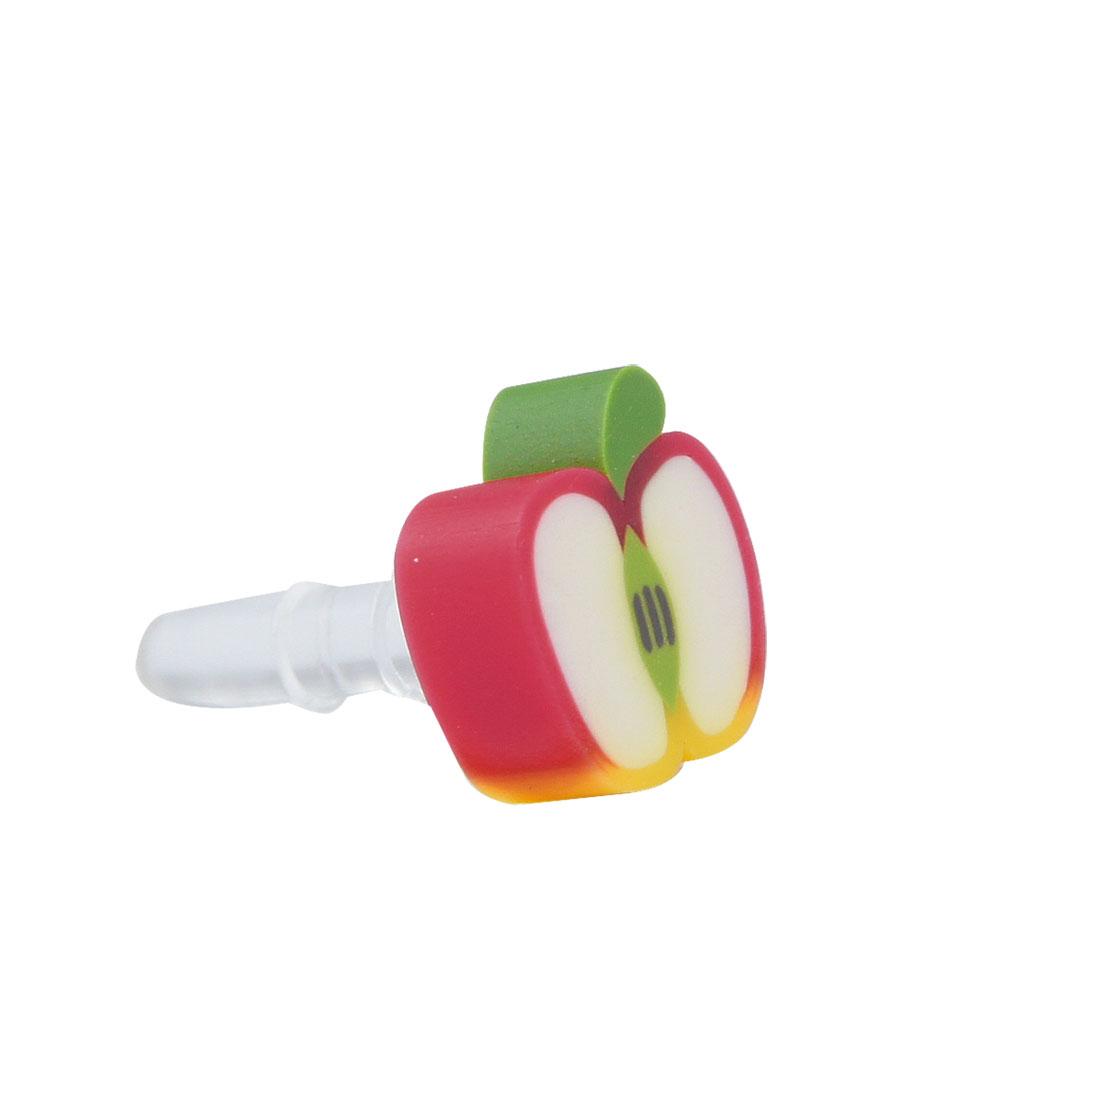 White Fruit Apple 3.5mm Earphone Ear Cap Dust Plug Jack for Cell Phone Smartphone